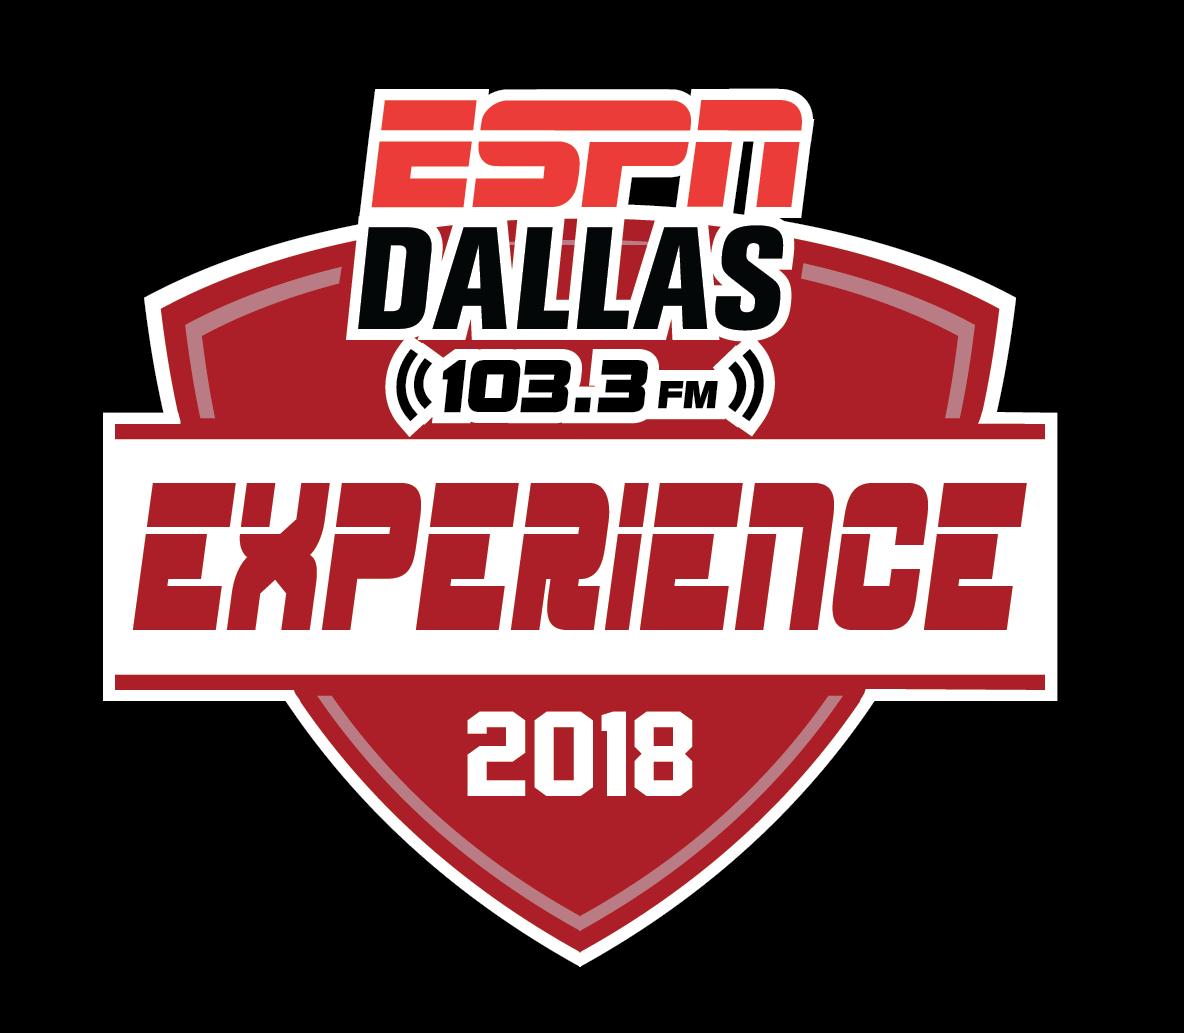 ESPN Experience 2018 Photos